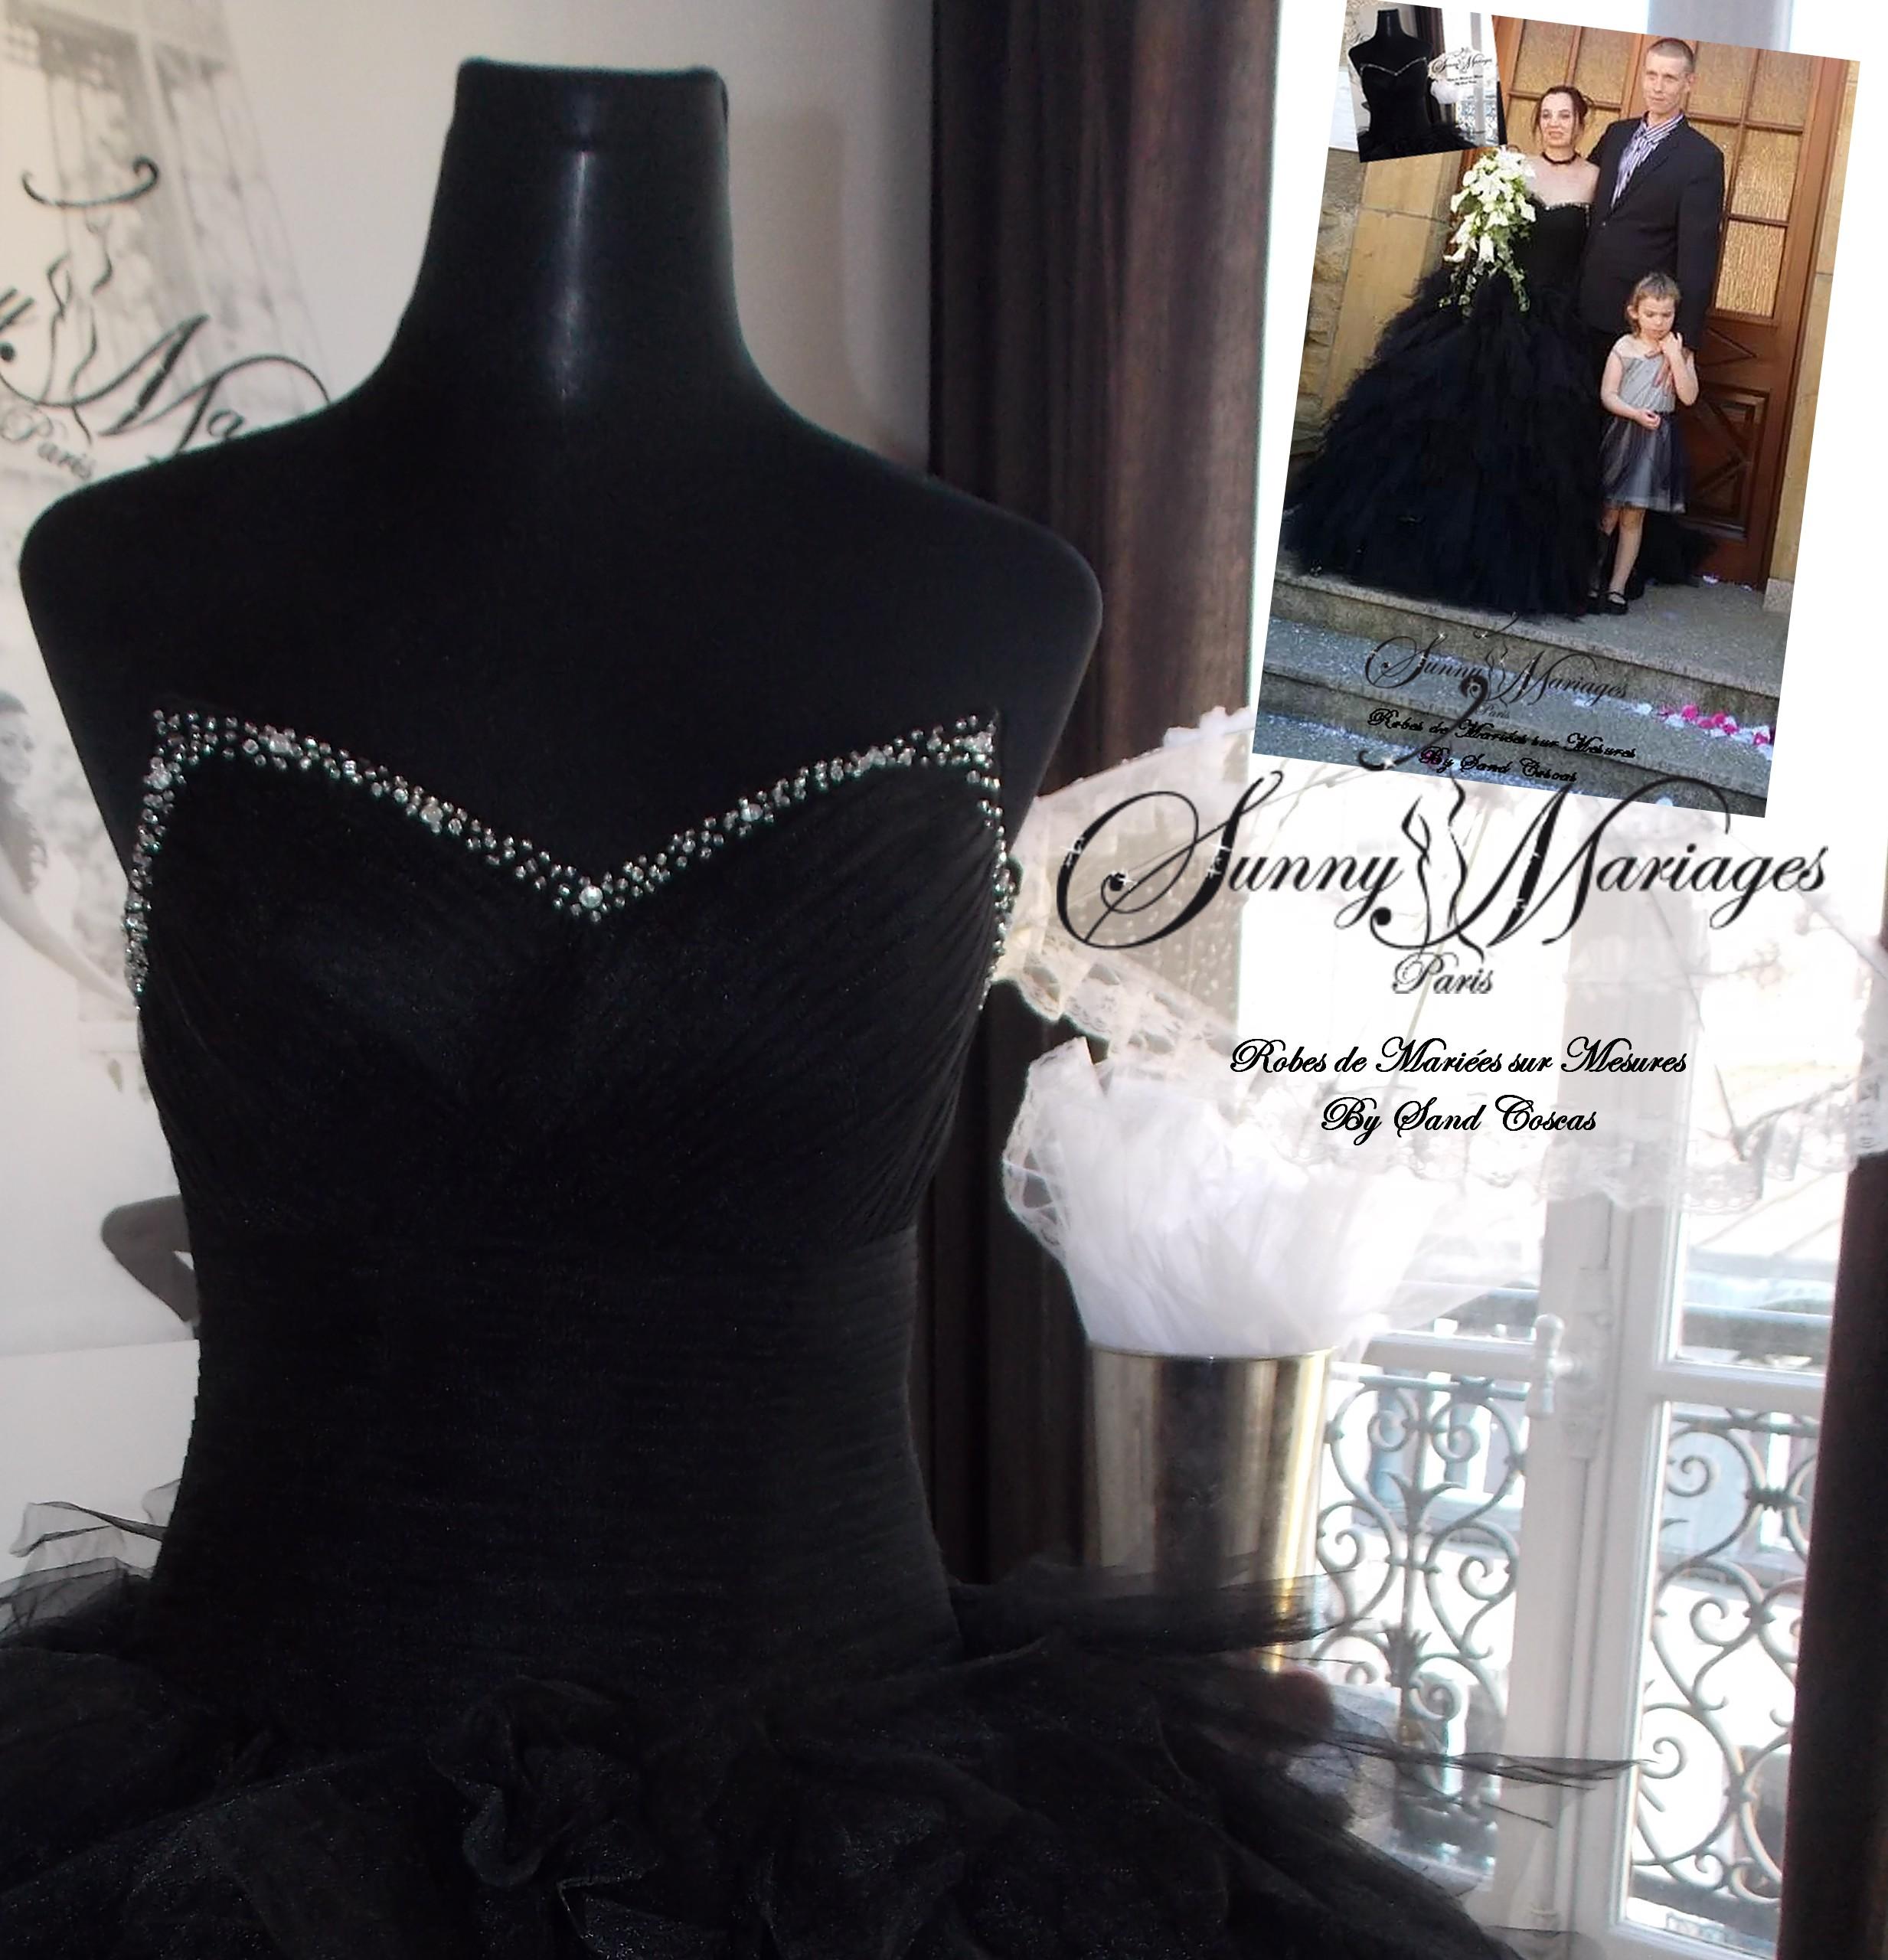 Robe de marie noire pas cher vente en ligne ou sur r v sunny mariage - Robe de mariee strass ...